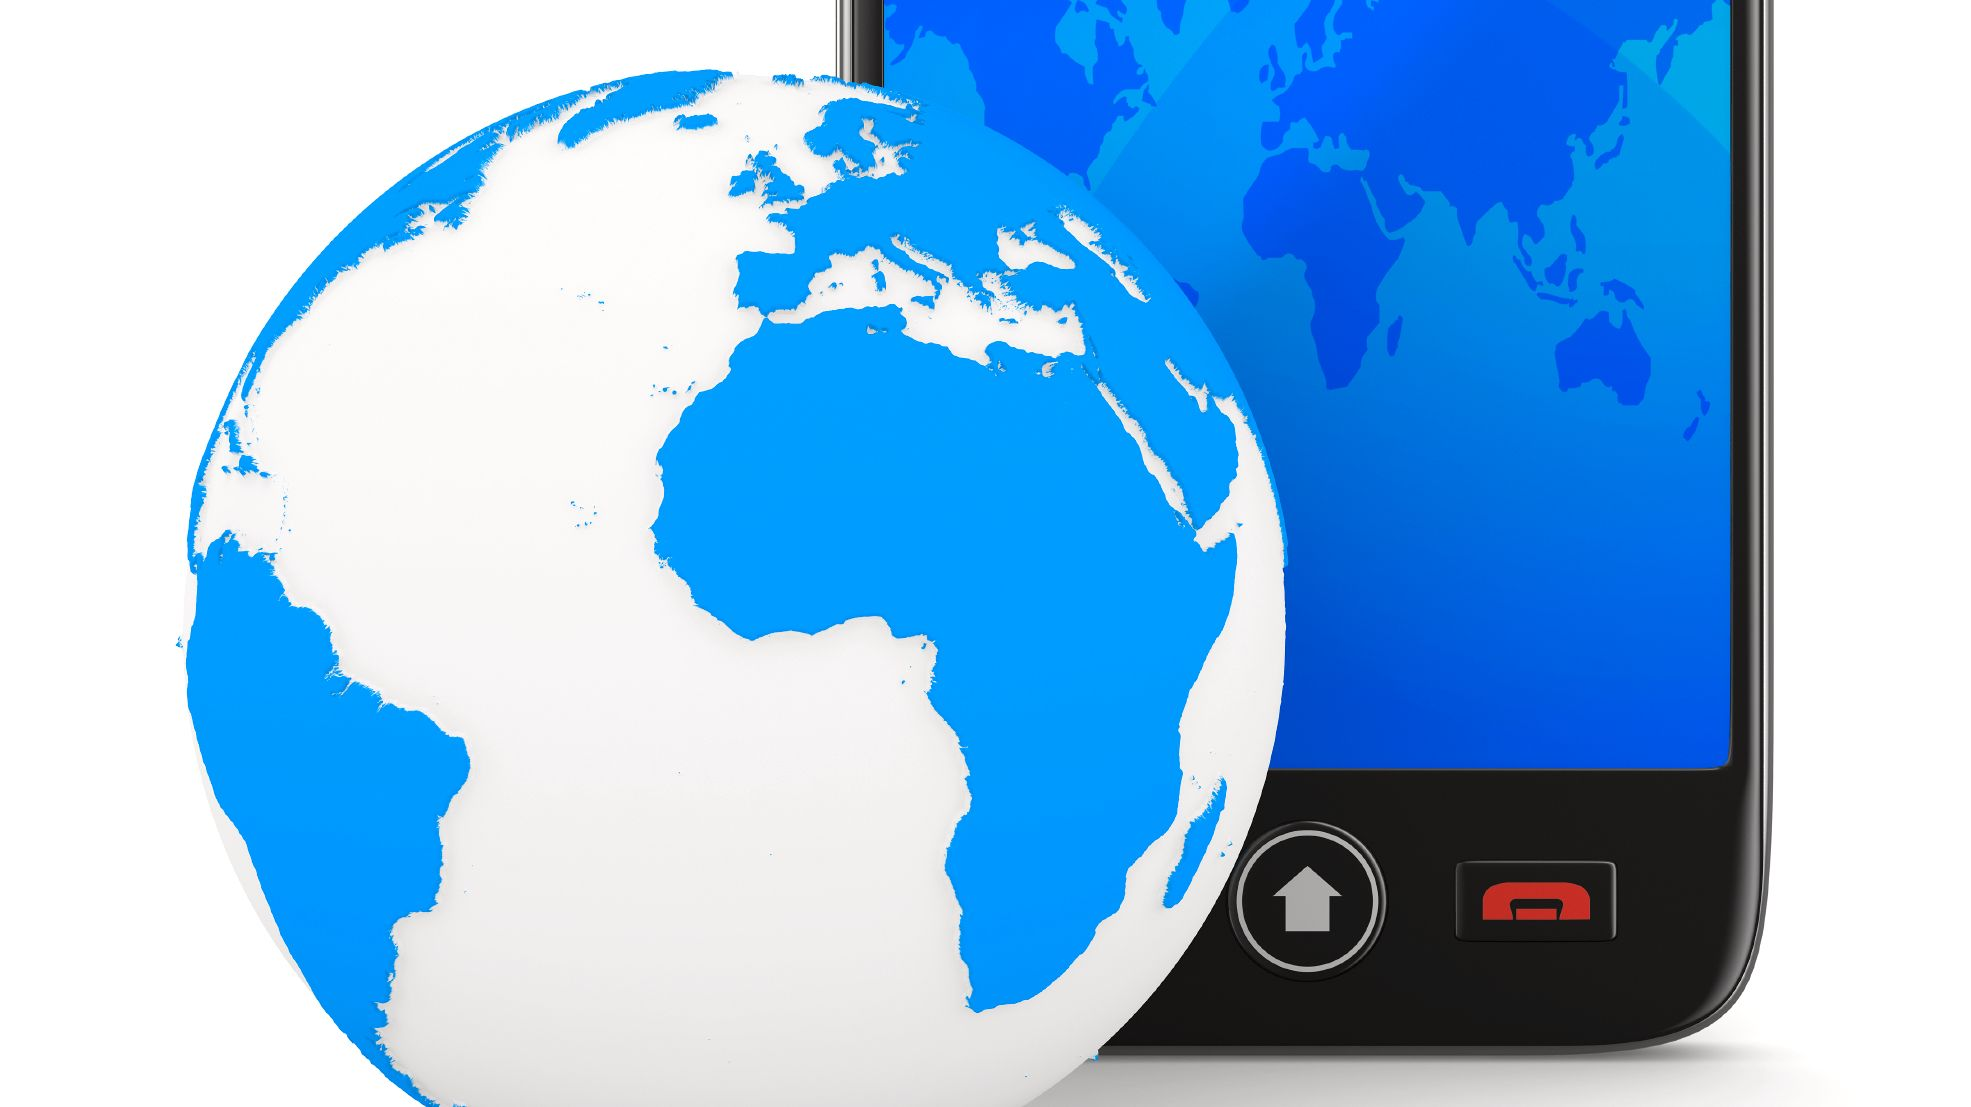 6 milliarder mobilabonnementer i verden